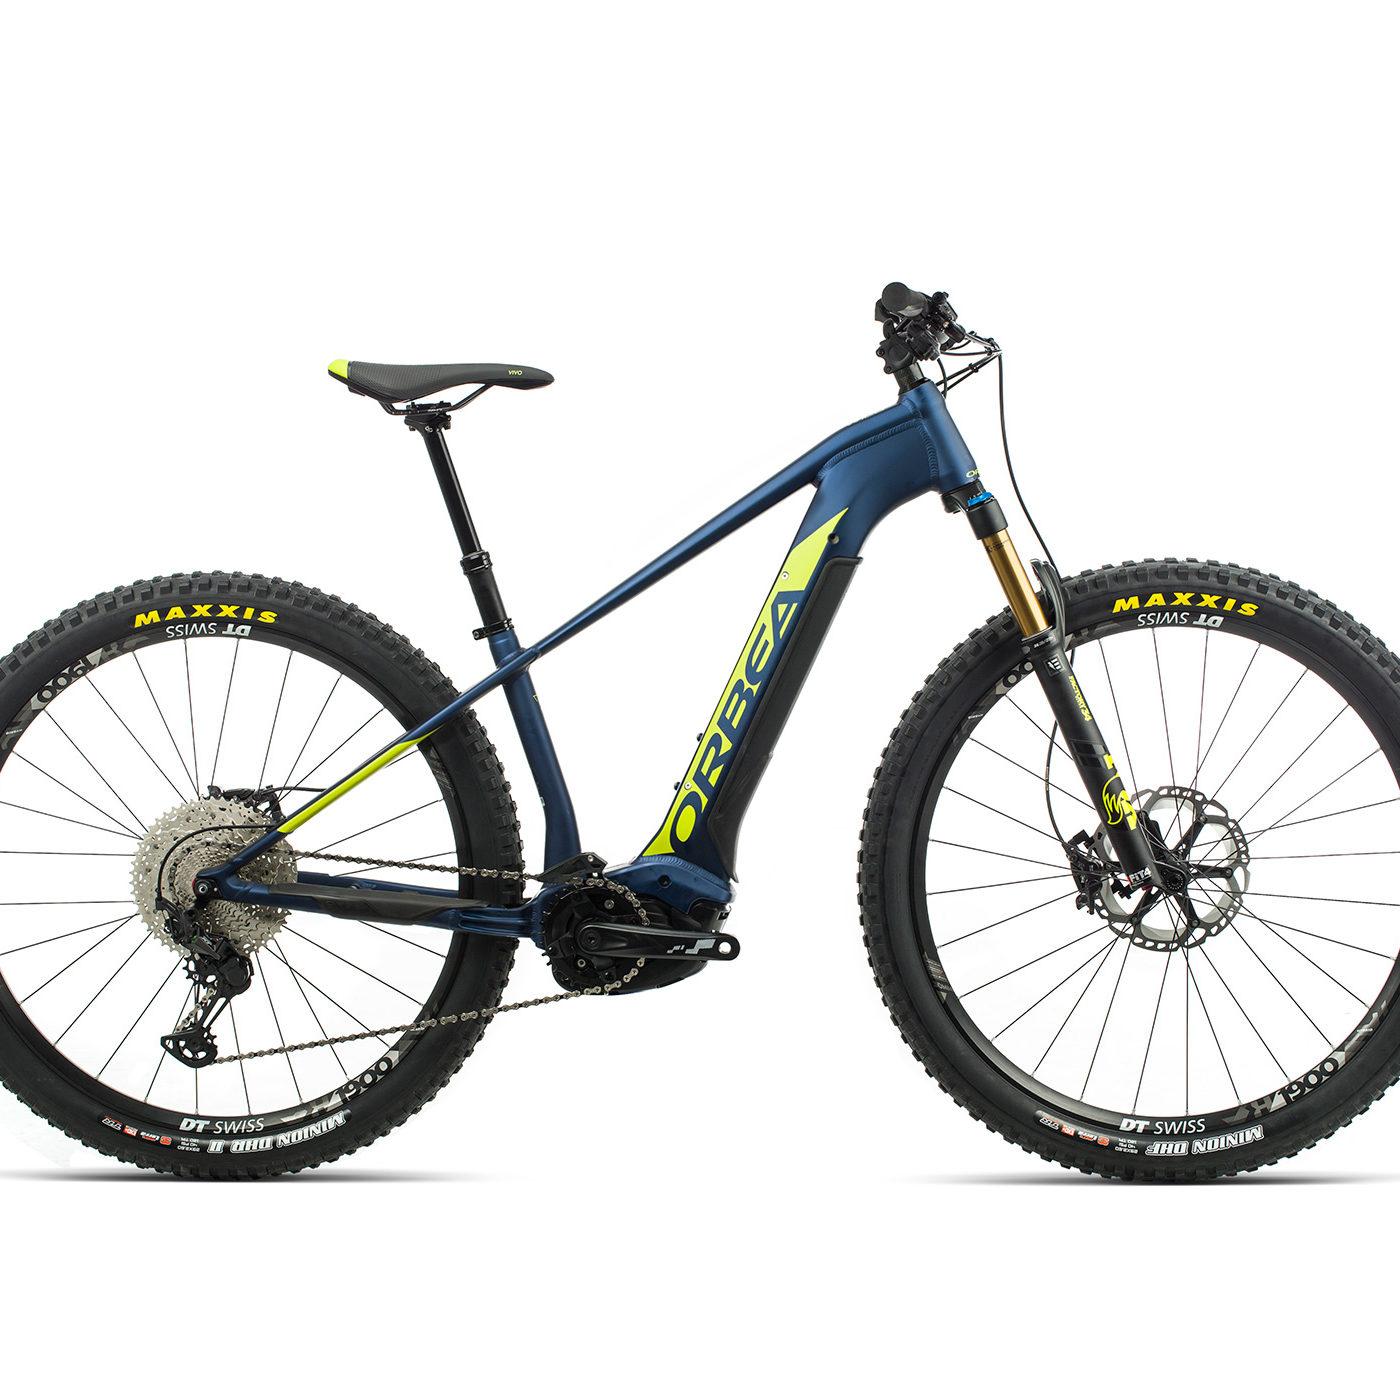 ORBEA WILD HT10 29 ebike - MARINE BLAUW MET / PISTACHE (DOF) @G-Bikes